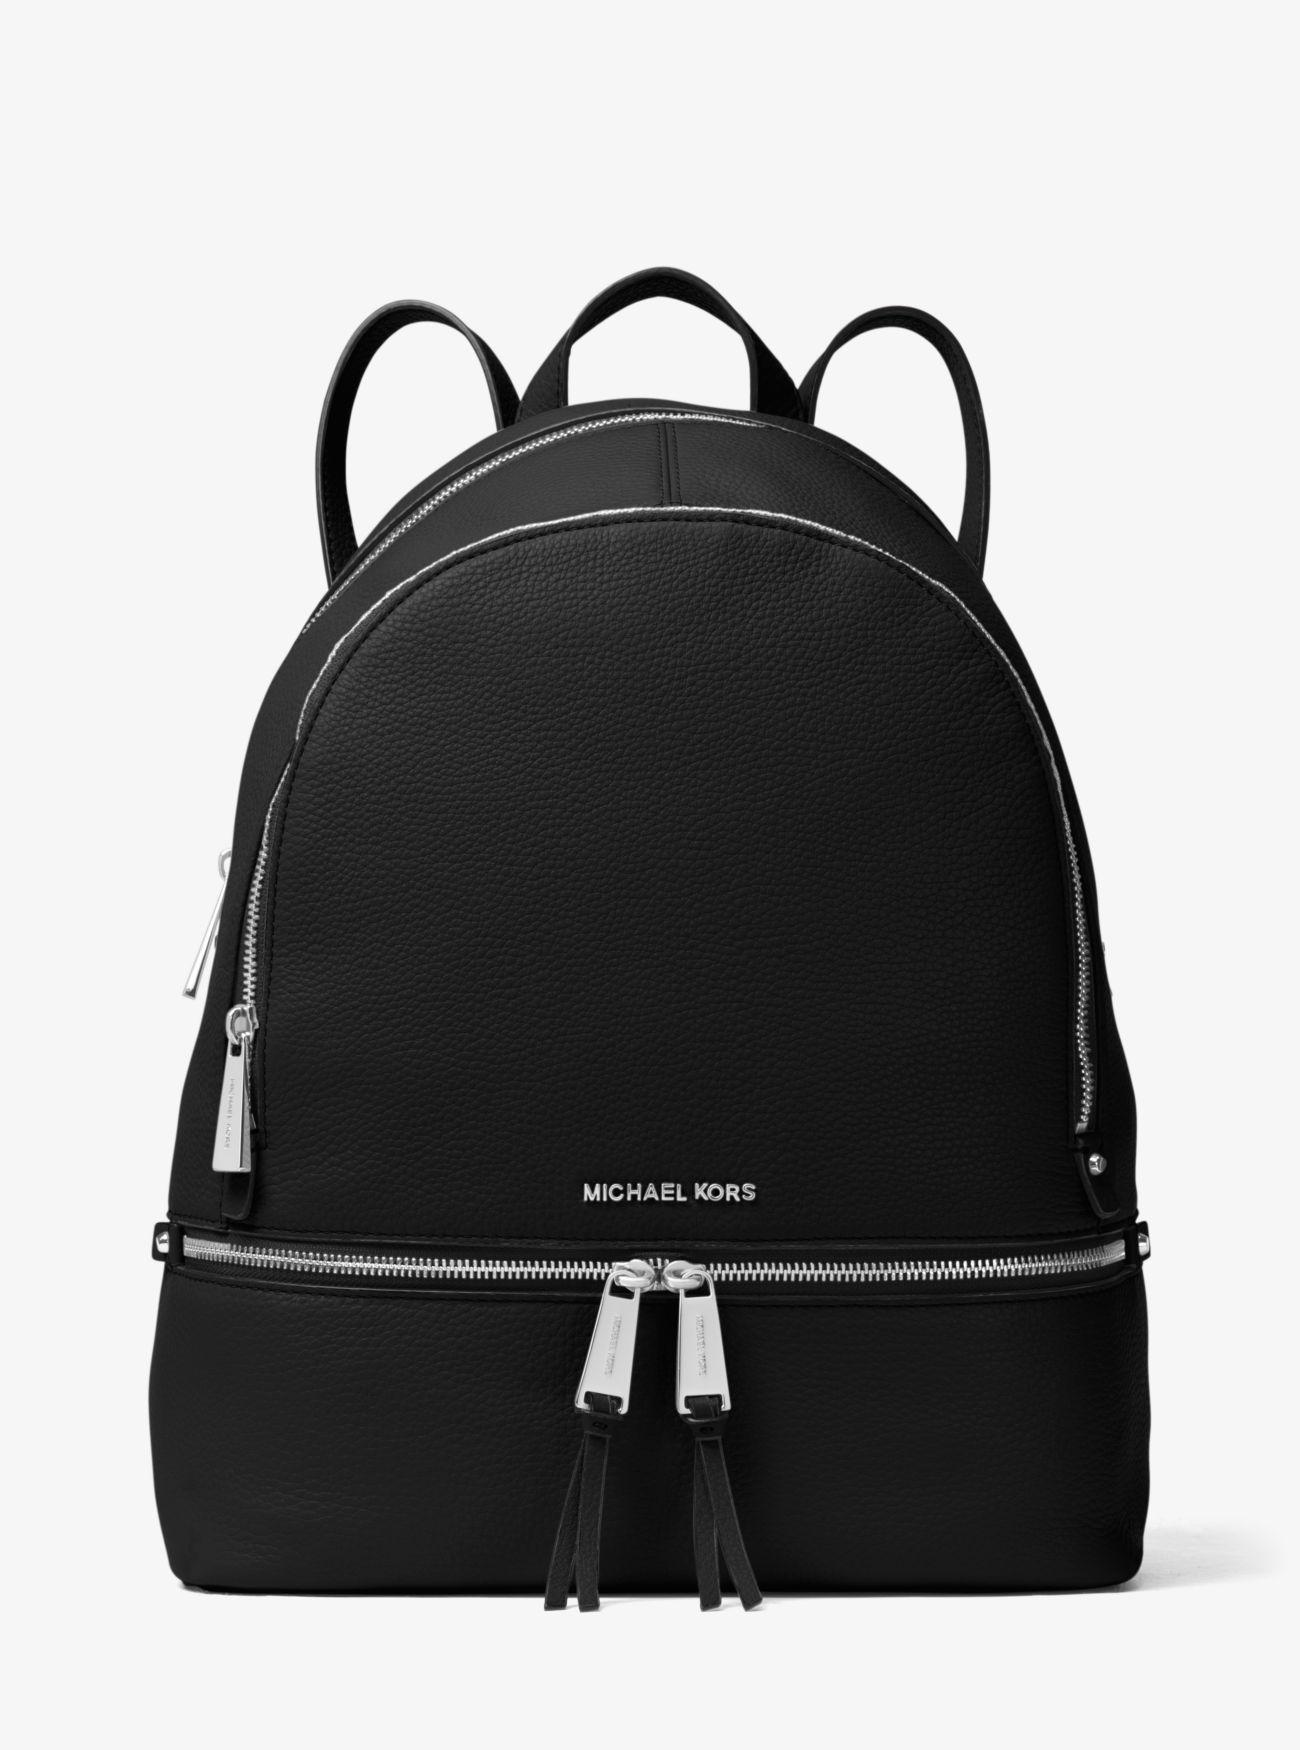 a37595f8087e53 Michael Kors - Black Rhea Large Leather Backpack - Lyst. View fullscreen